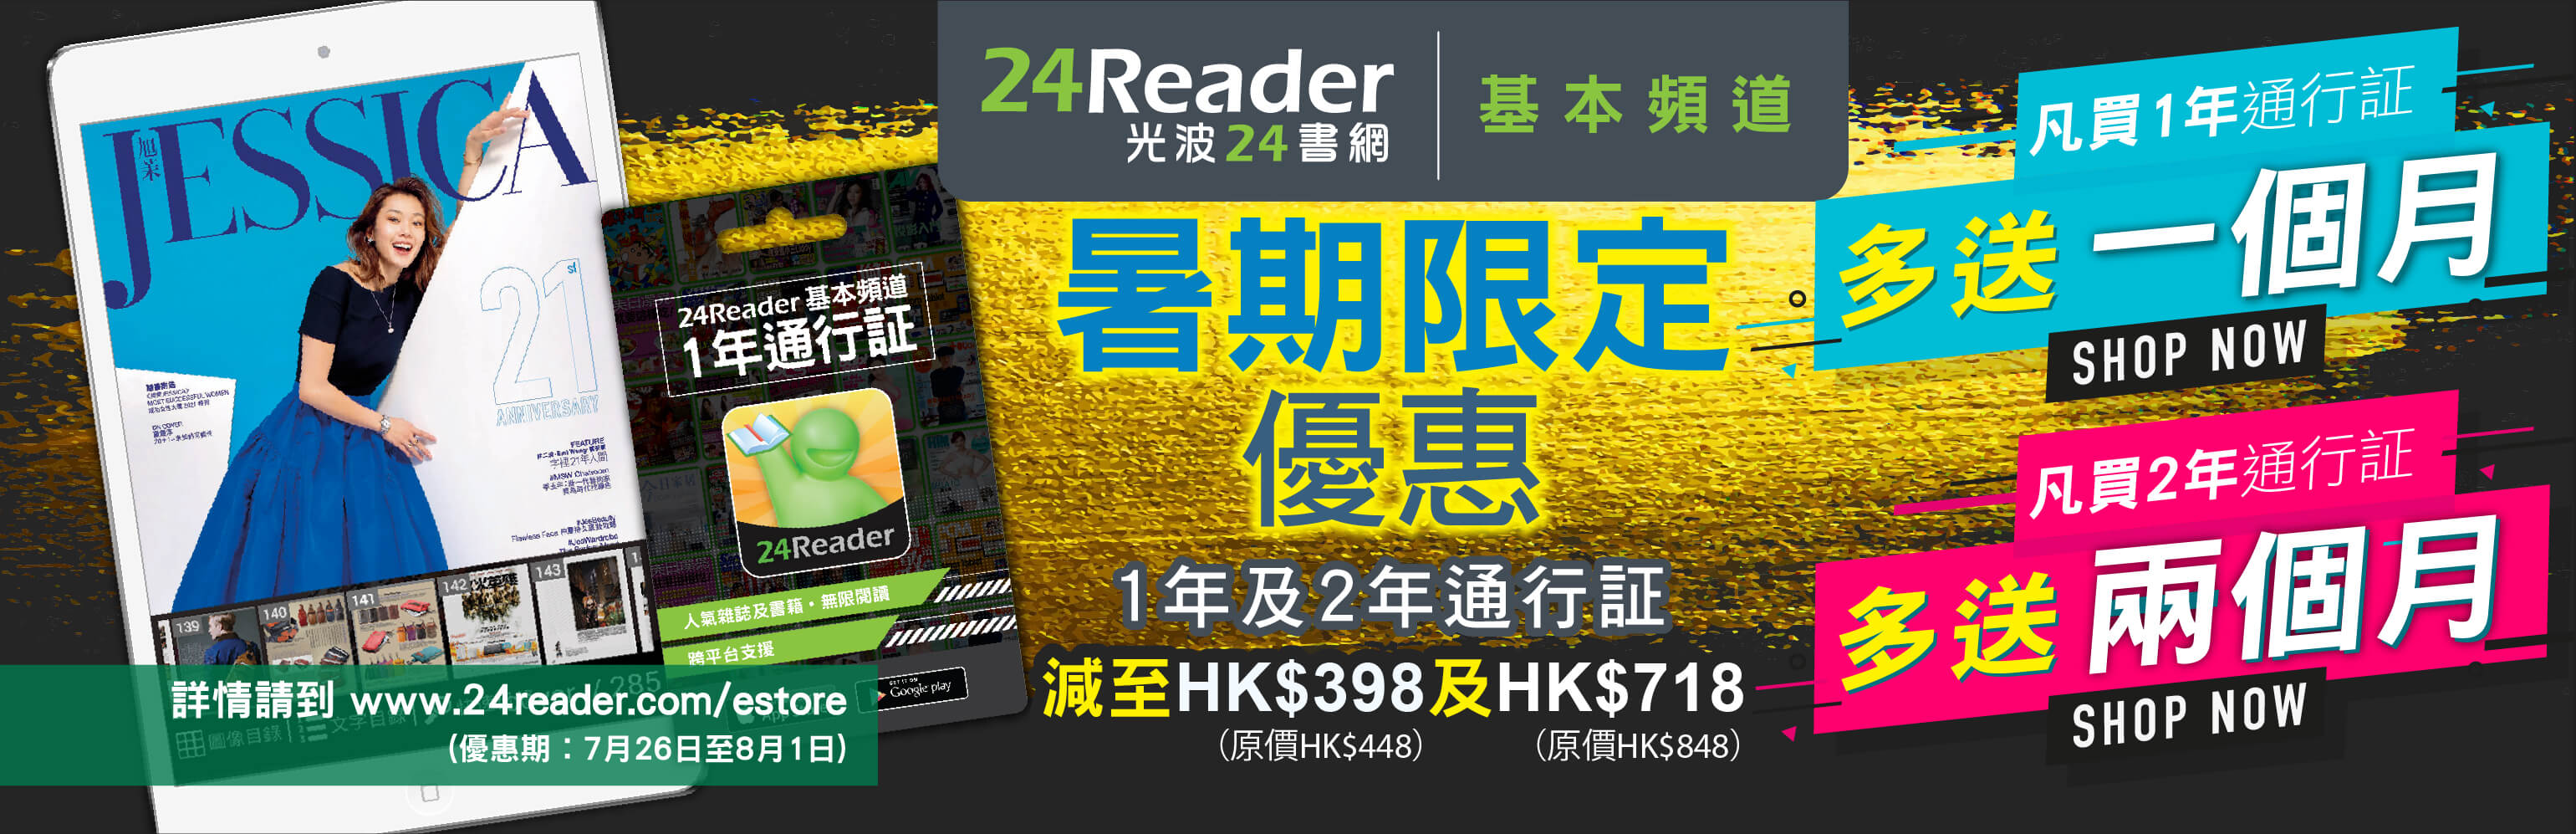 24Reader 基本頻道 暑期限定優惠